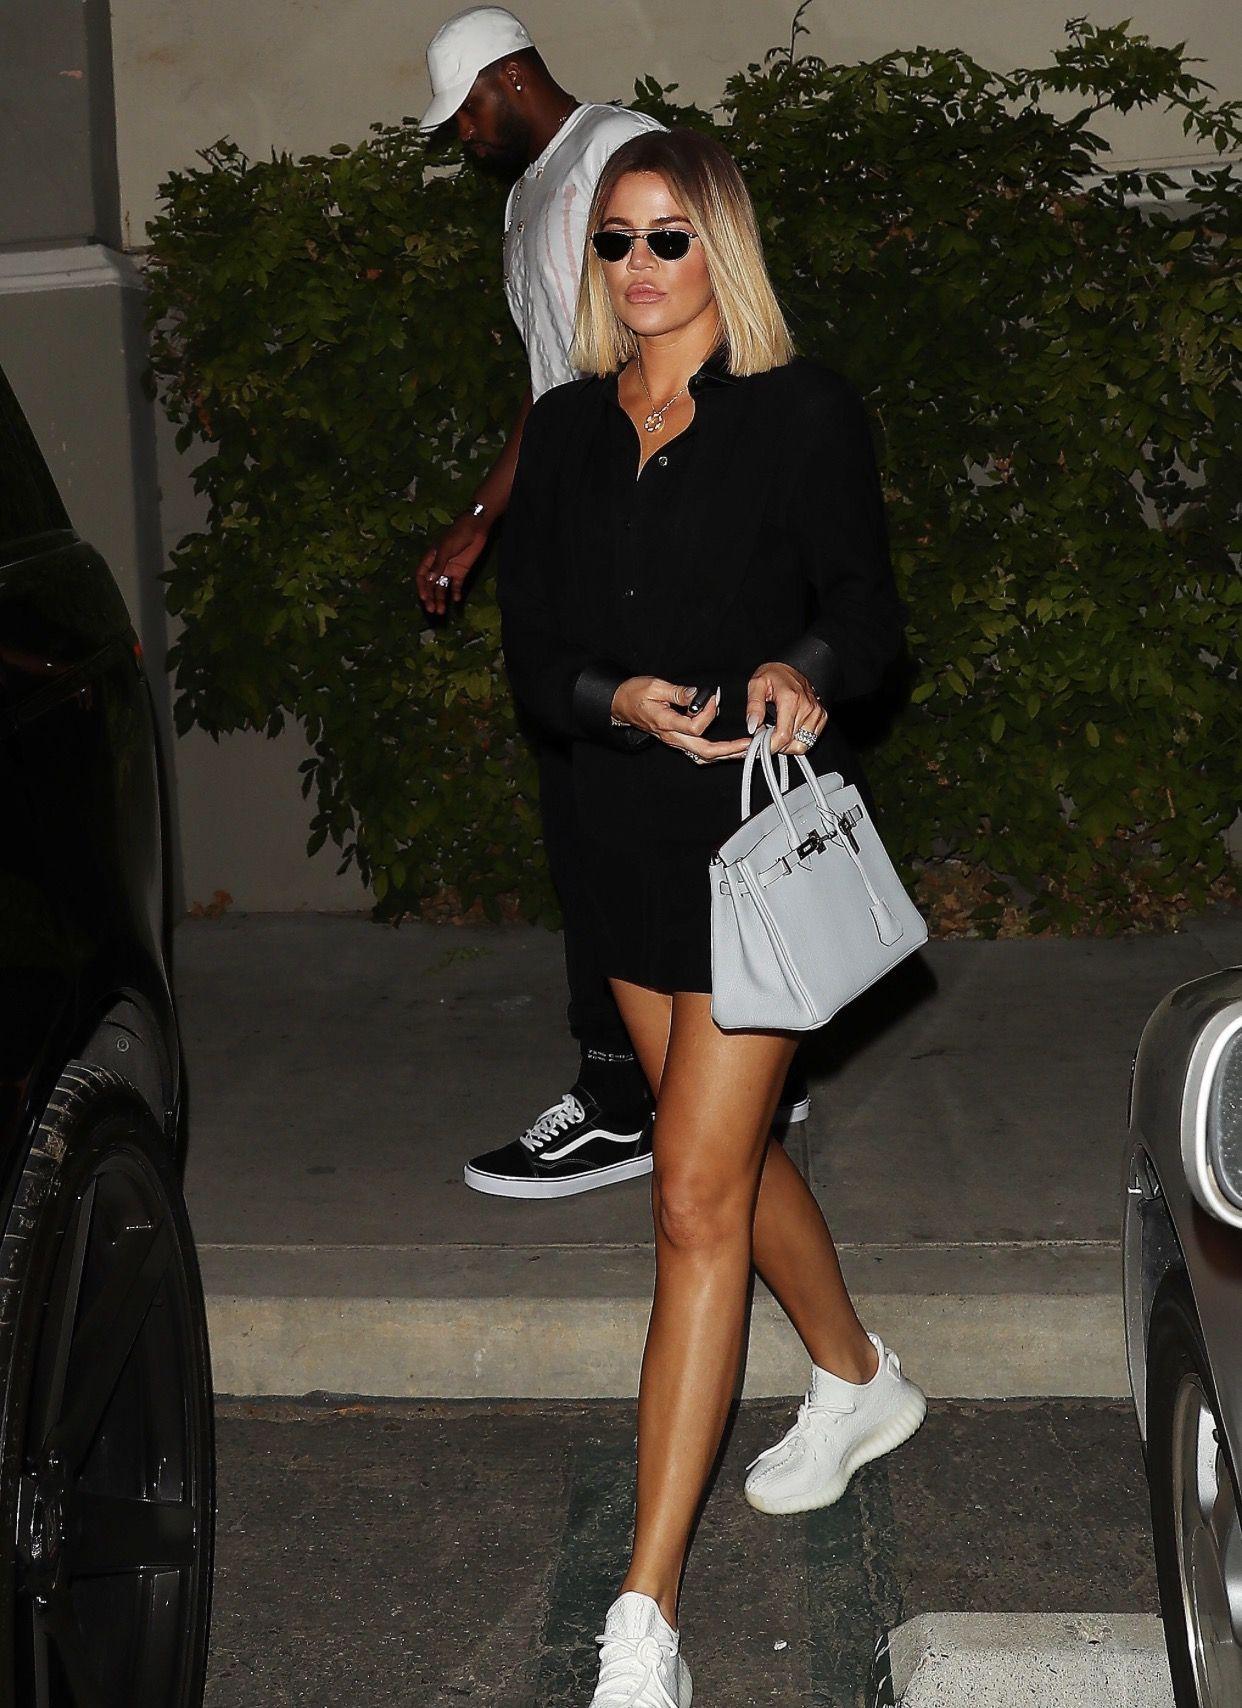 Khloe kardashian flannel shirt  Khloe and Tristan  Khloe Kardashian Style  Pinterest  Khloe